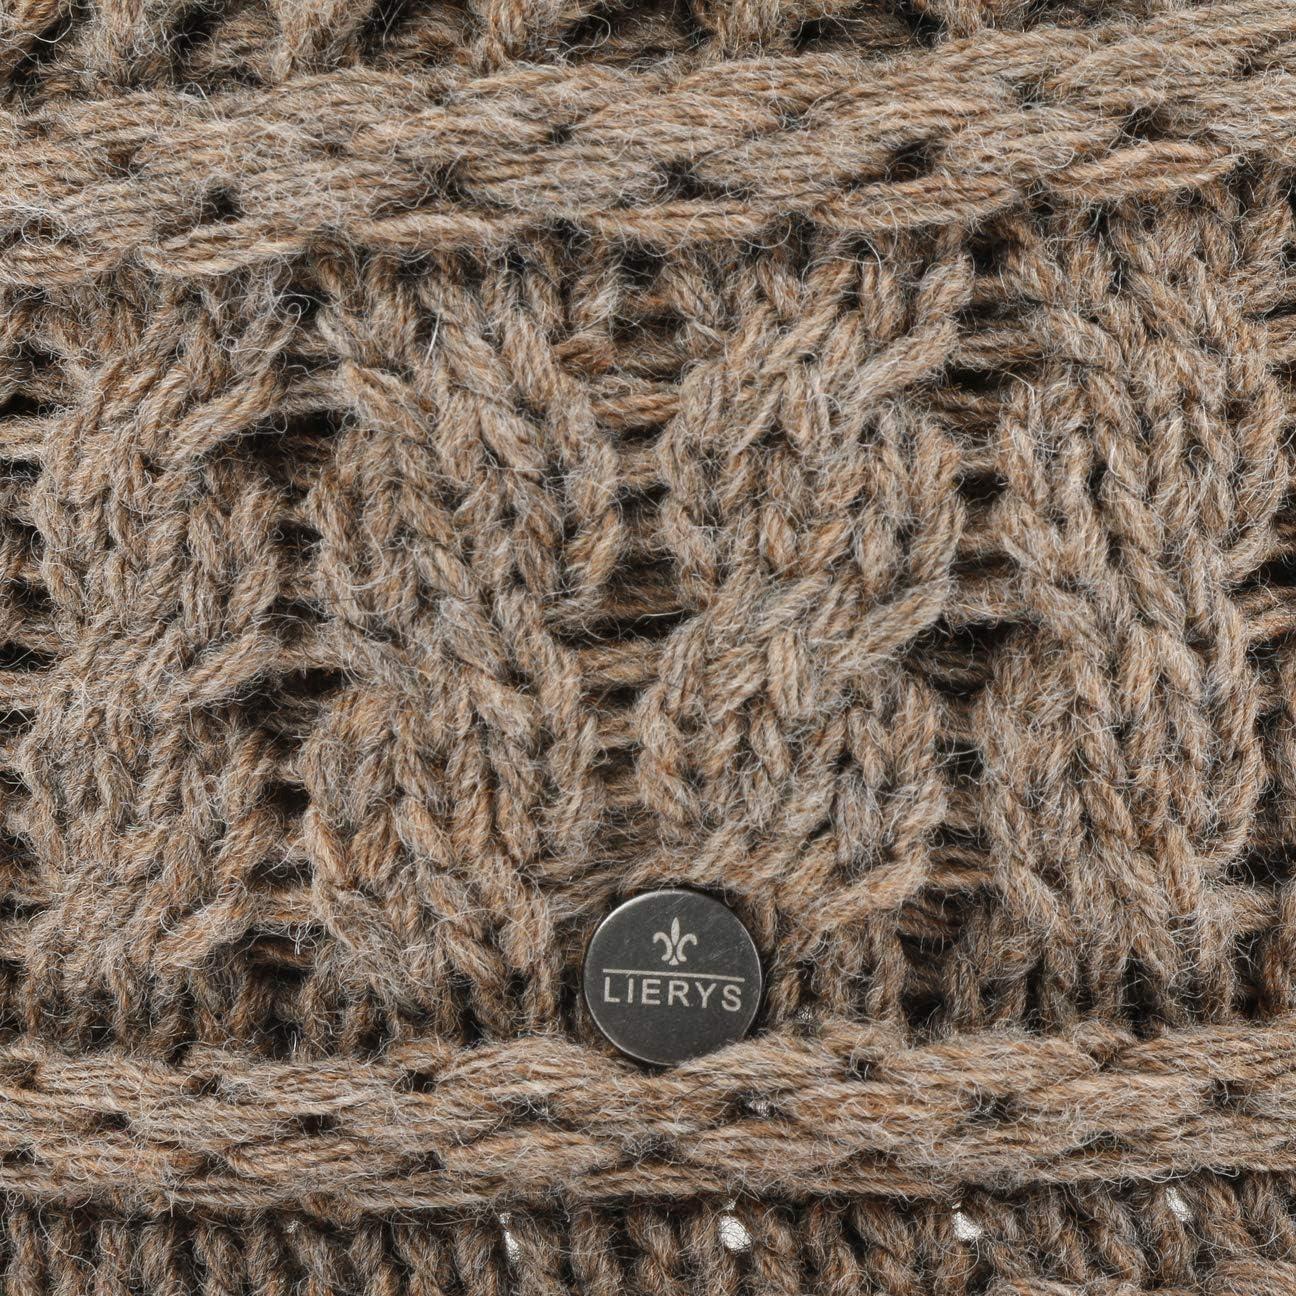 Lierys Binetta Wollhut mit Kaschmir Damenhut Glockenhut Wollglocke Damenglocke Damen Made in Italy Ripsband Ripsband Herbst-Winter